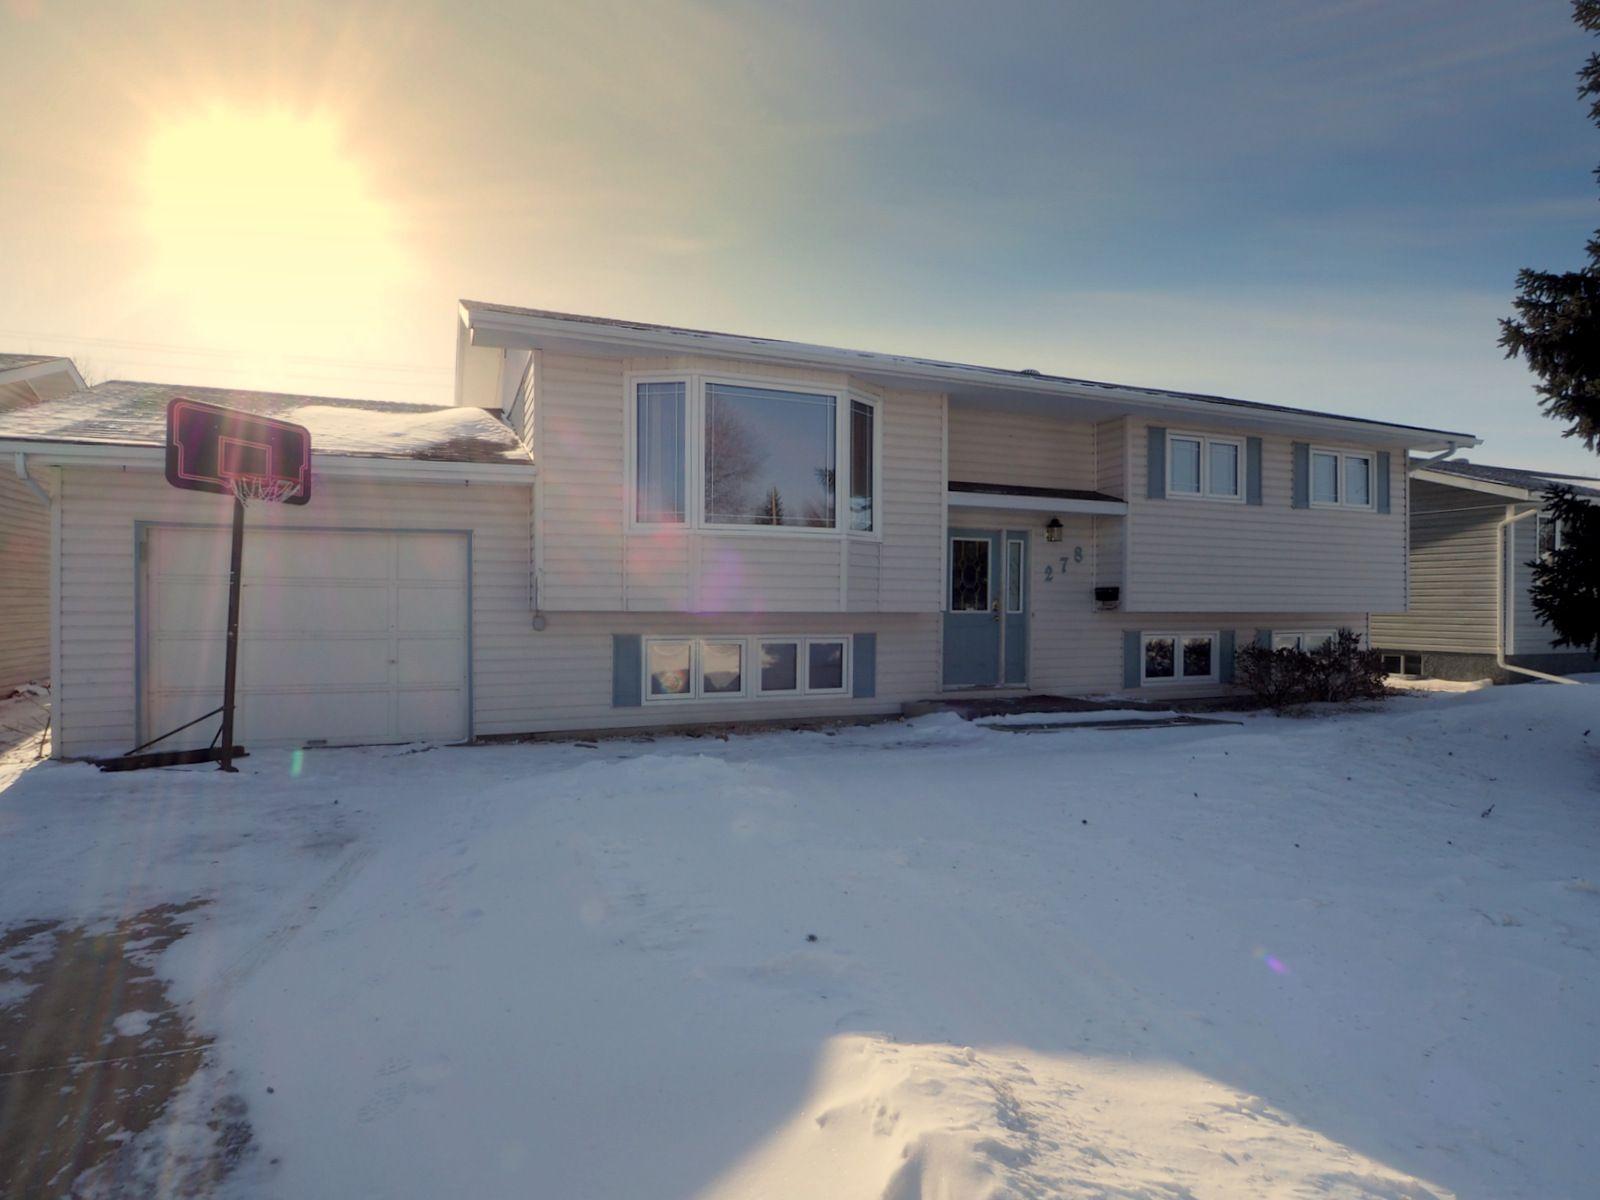 Main Photo: 278 Seneca Street in Portage la Prairie: House for sale : MLS®# 202102669